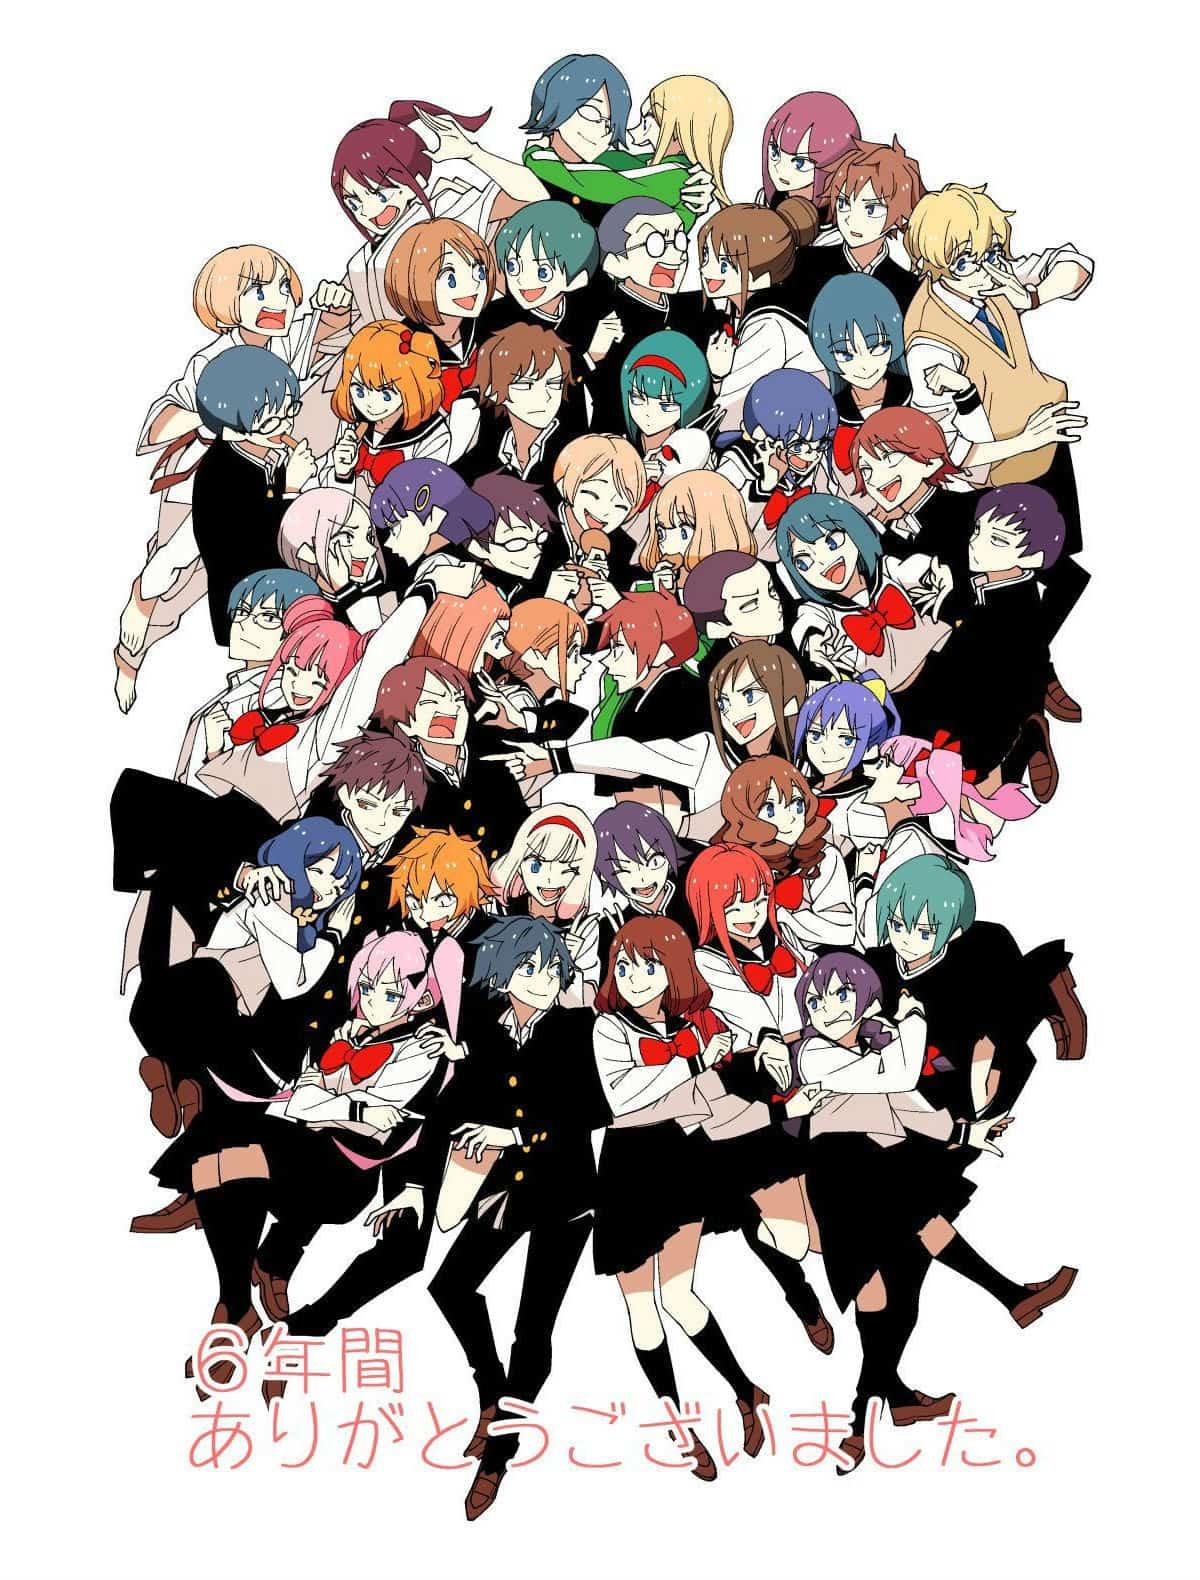 Tsurezure Children Manga Volume 12 Cover Art